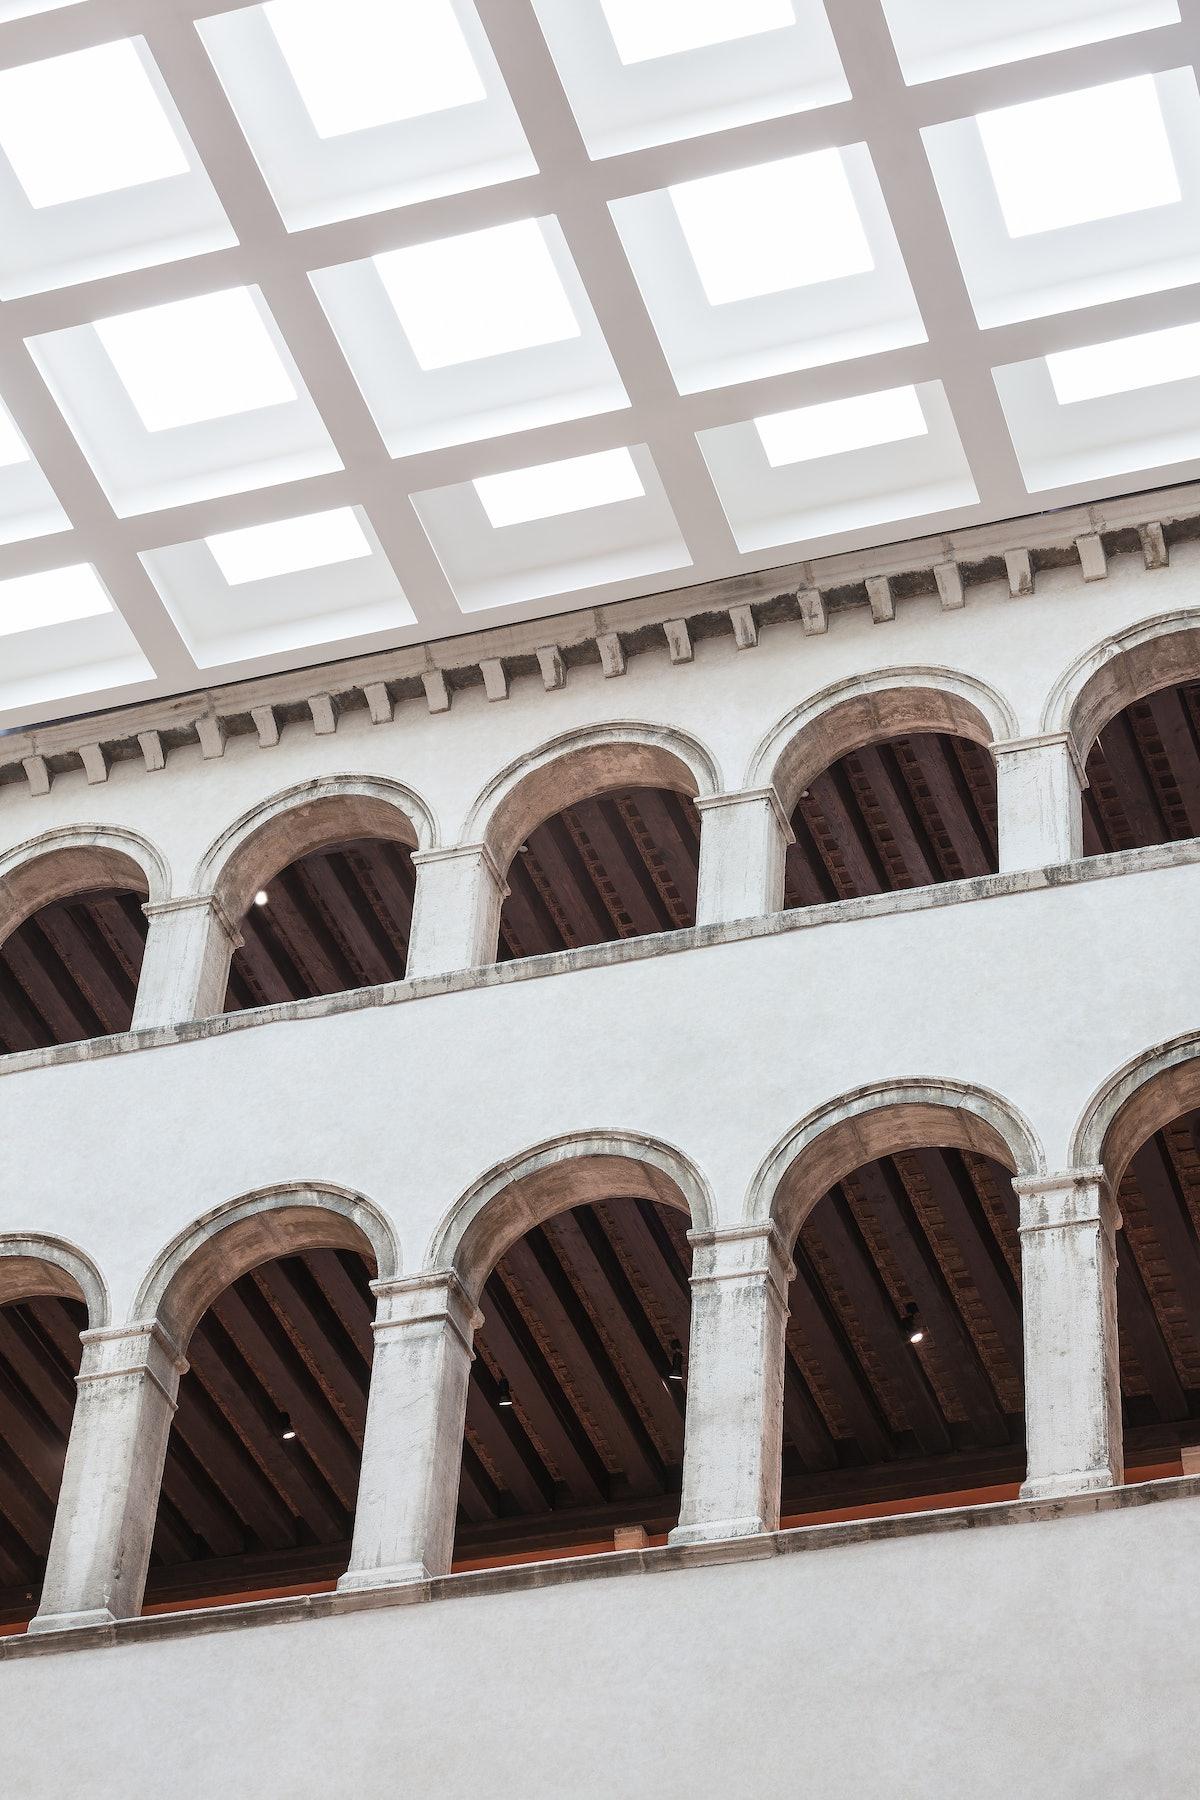 Rem Koolhaas' Fondaco dei Tedeschi